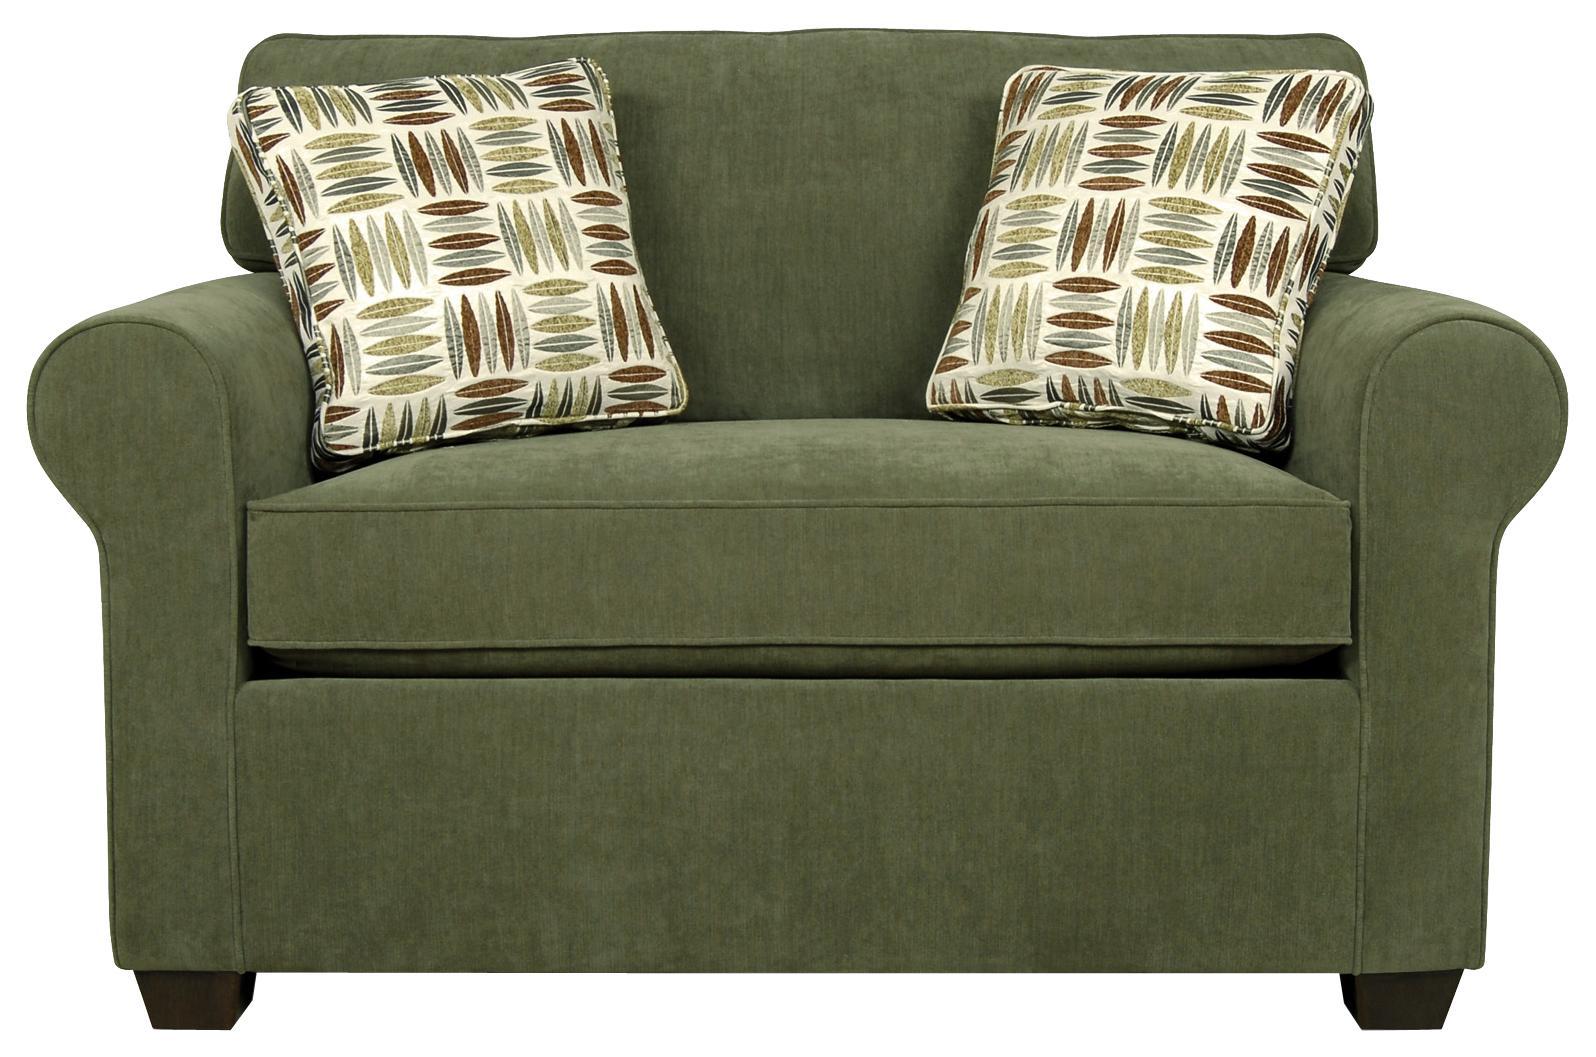 Twin Sleeper Sofa stylish sleeper sofa twin magnificent home renovation ideas with twin  sleeper sofas PNZAQKP